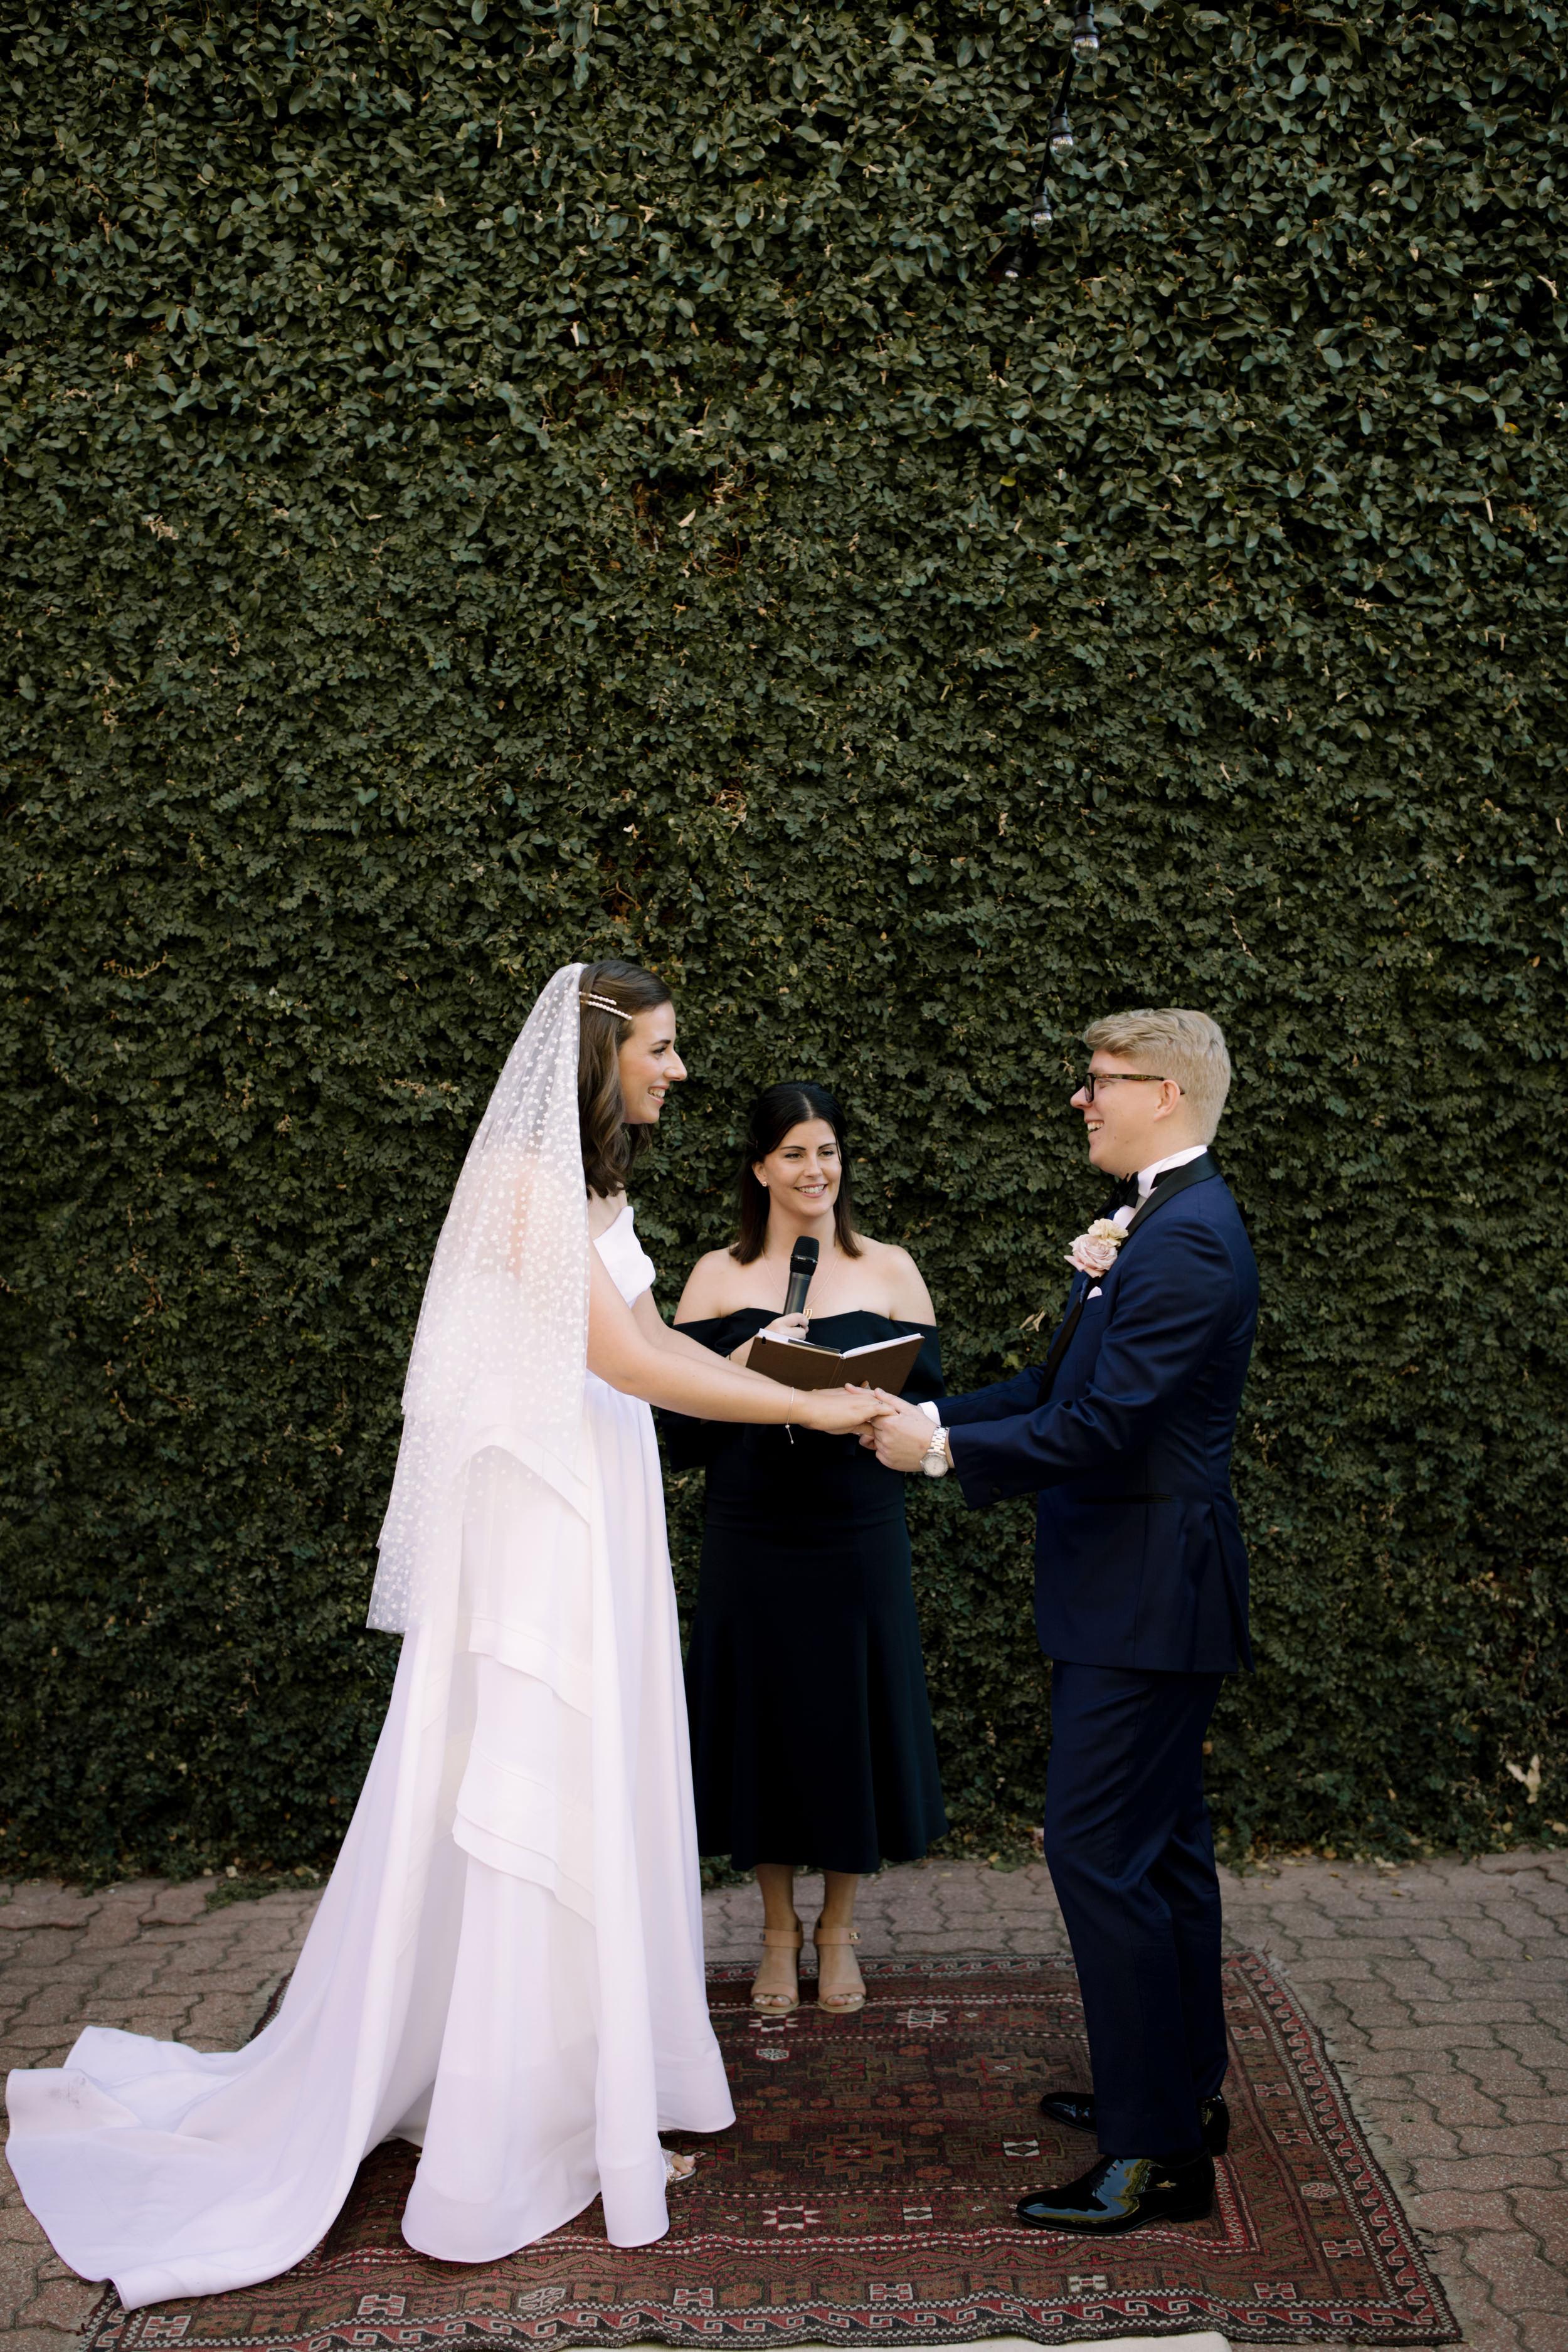 I-Got-You-Babe-Weddings-Tahlia&Mitch-Butler-Lane-Wedding0089.JPG